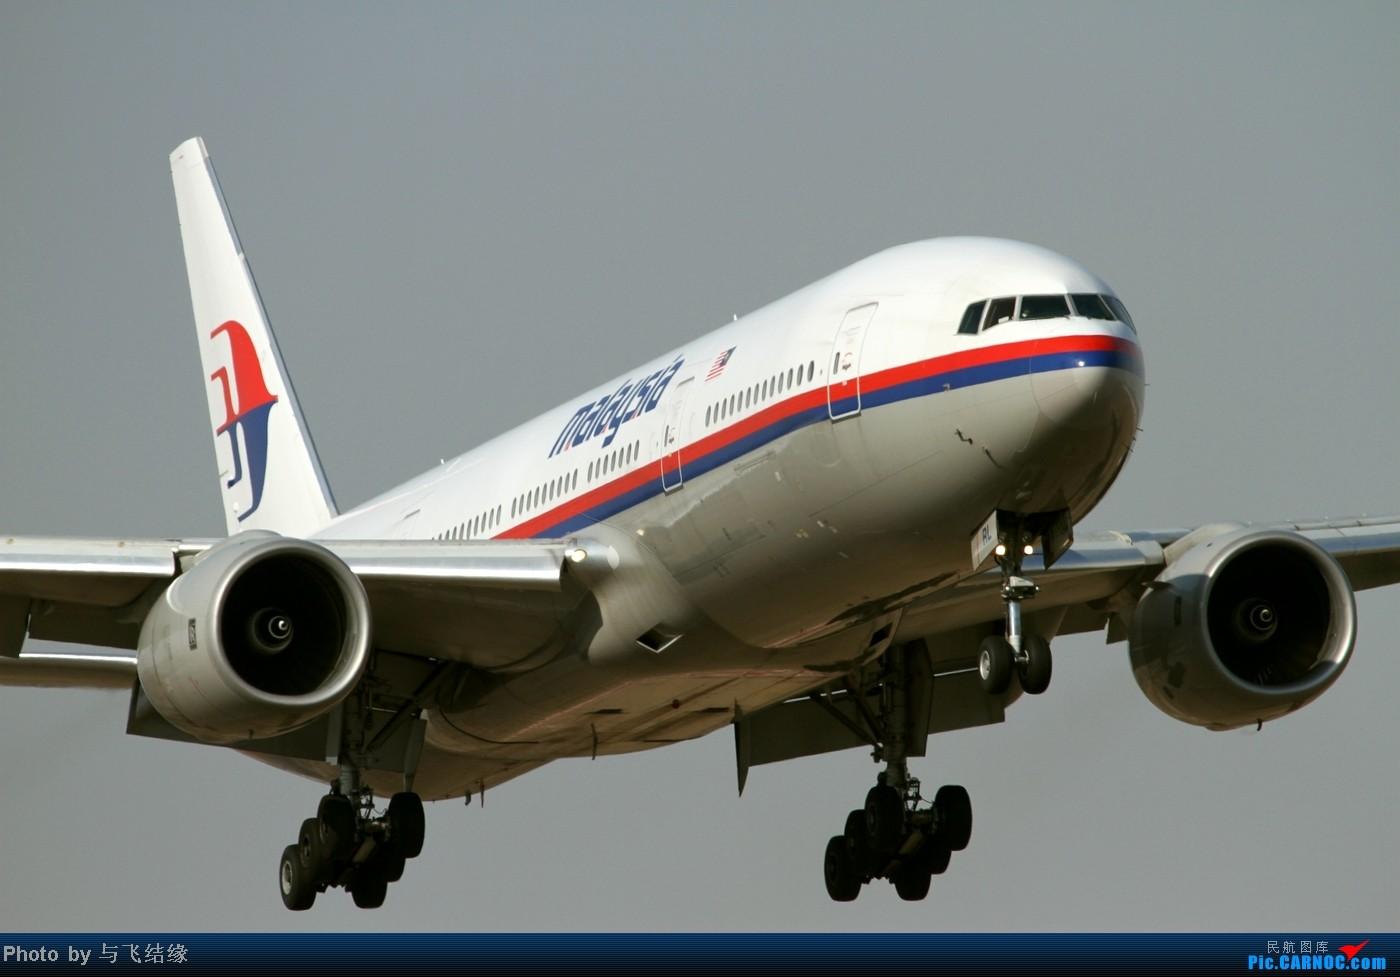 Re:[原创]喜欢777吗?九家航空公司的777大头近进照,777控们进来看看。 BOEING 777-200 9M-MRL 中国北京首都机场